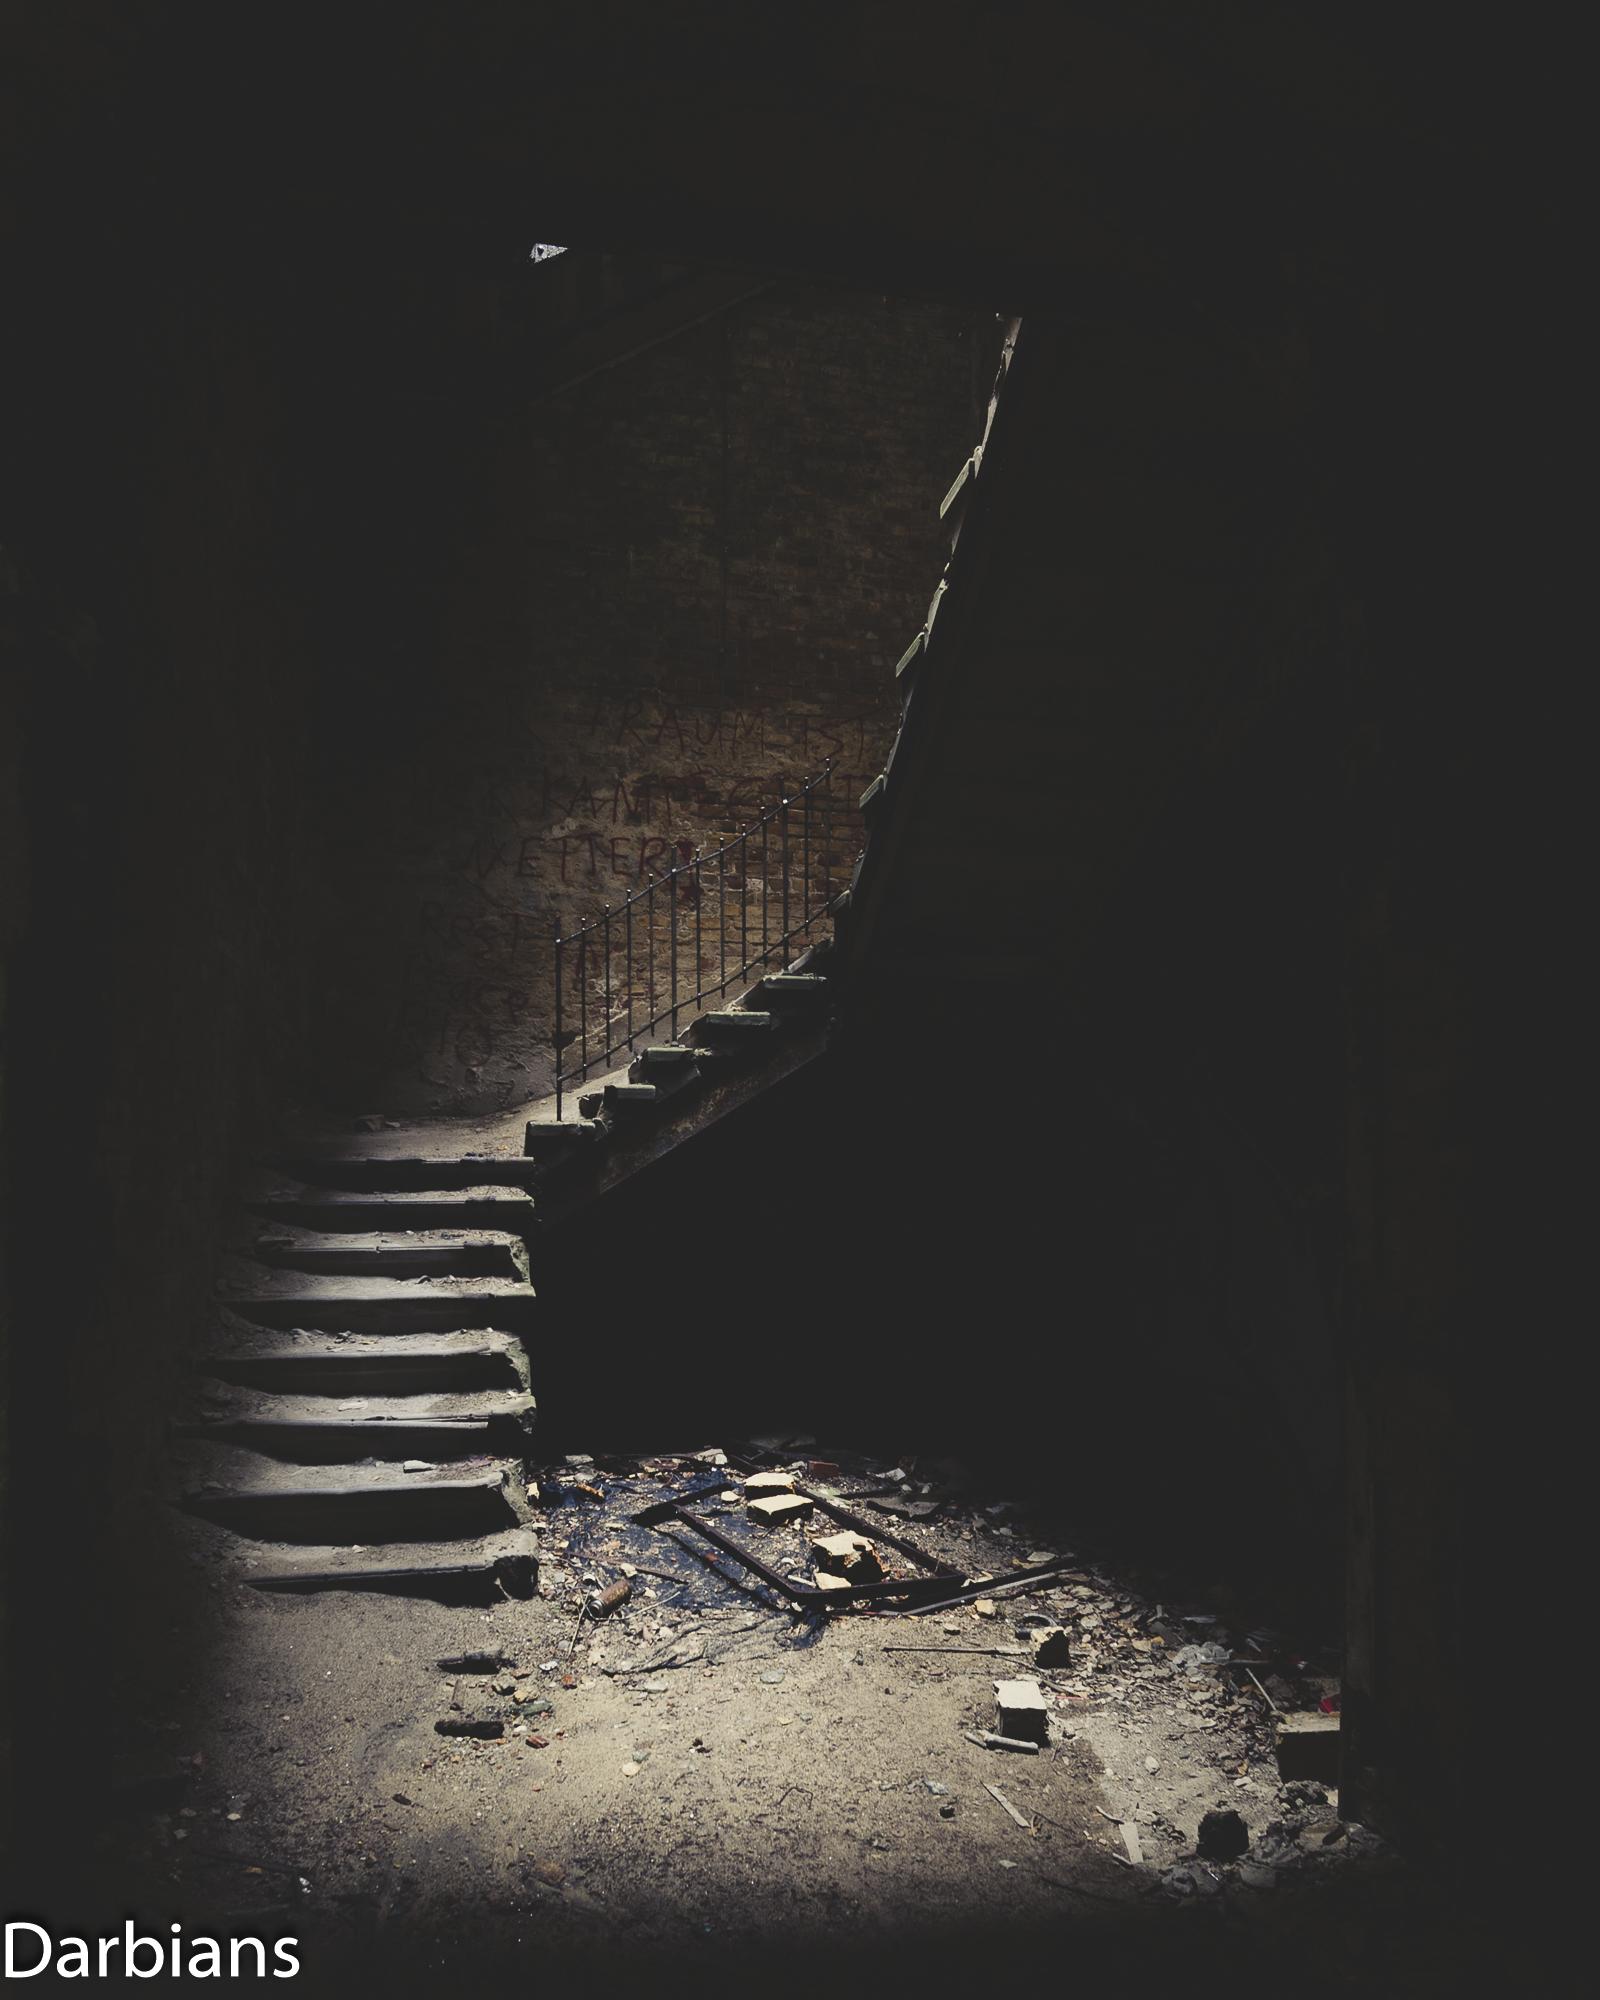 Beelitz Female Pavilions: The famous staircase